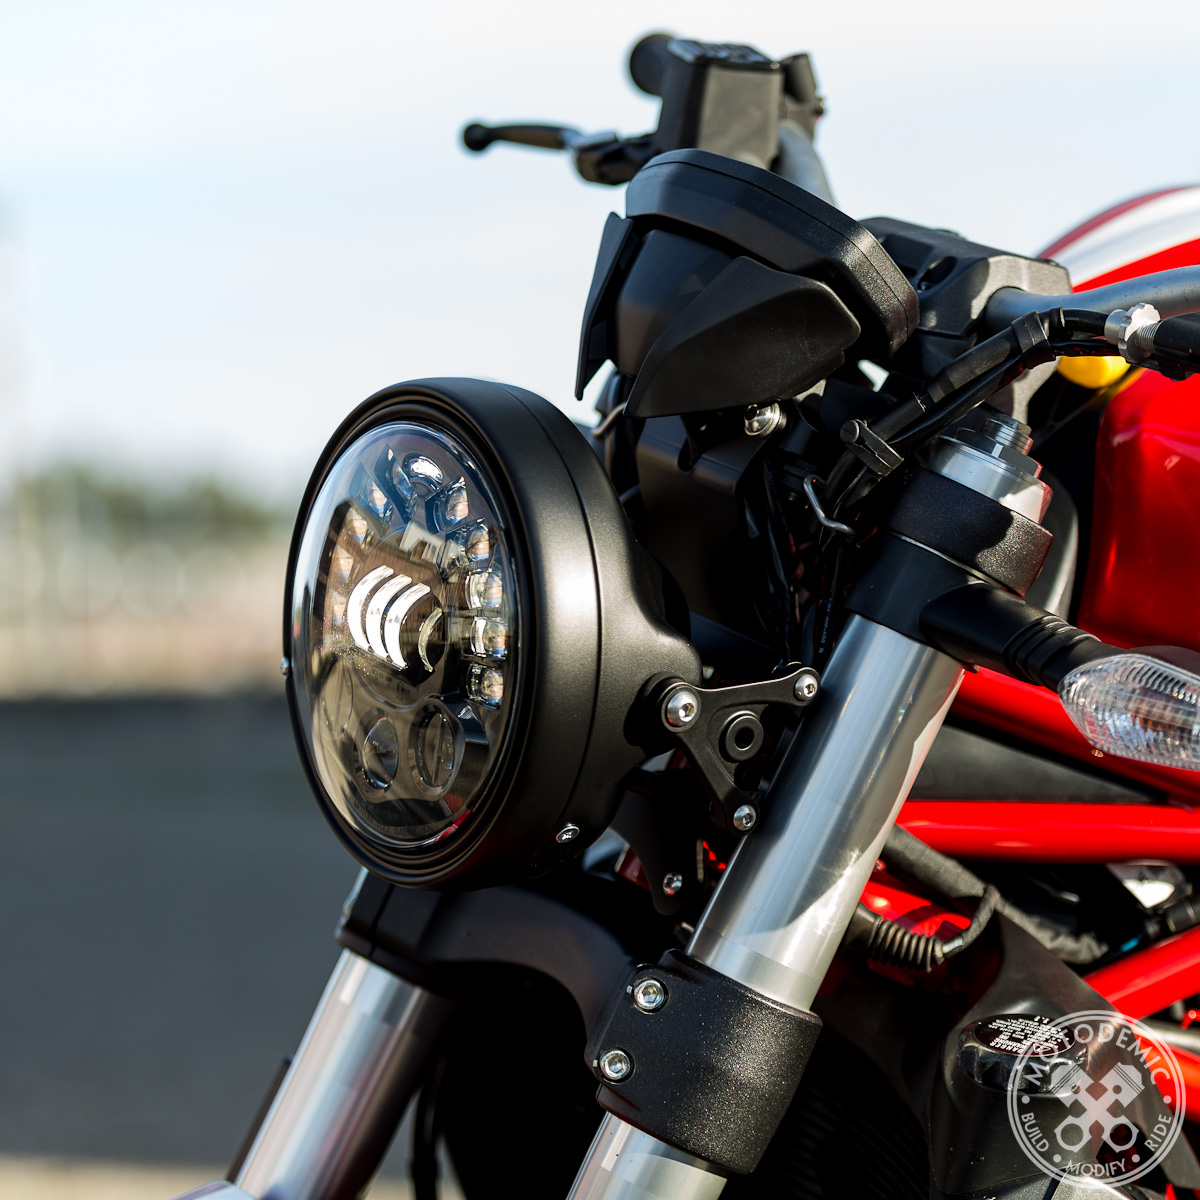 Ducati Monster Streetfighter Headlight